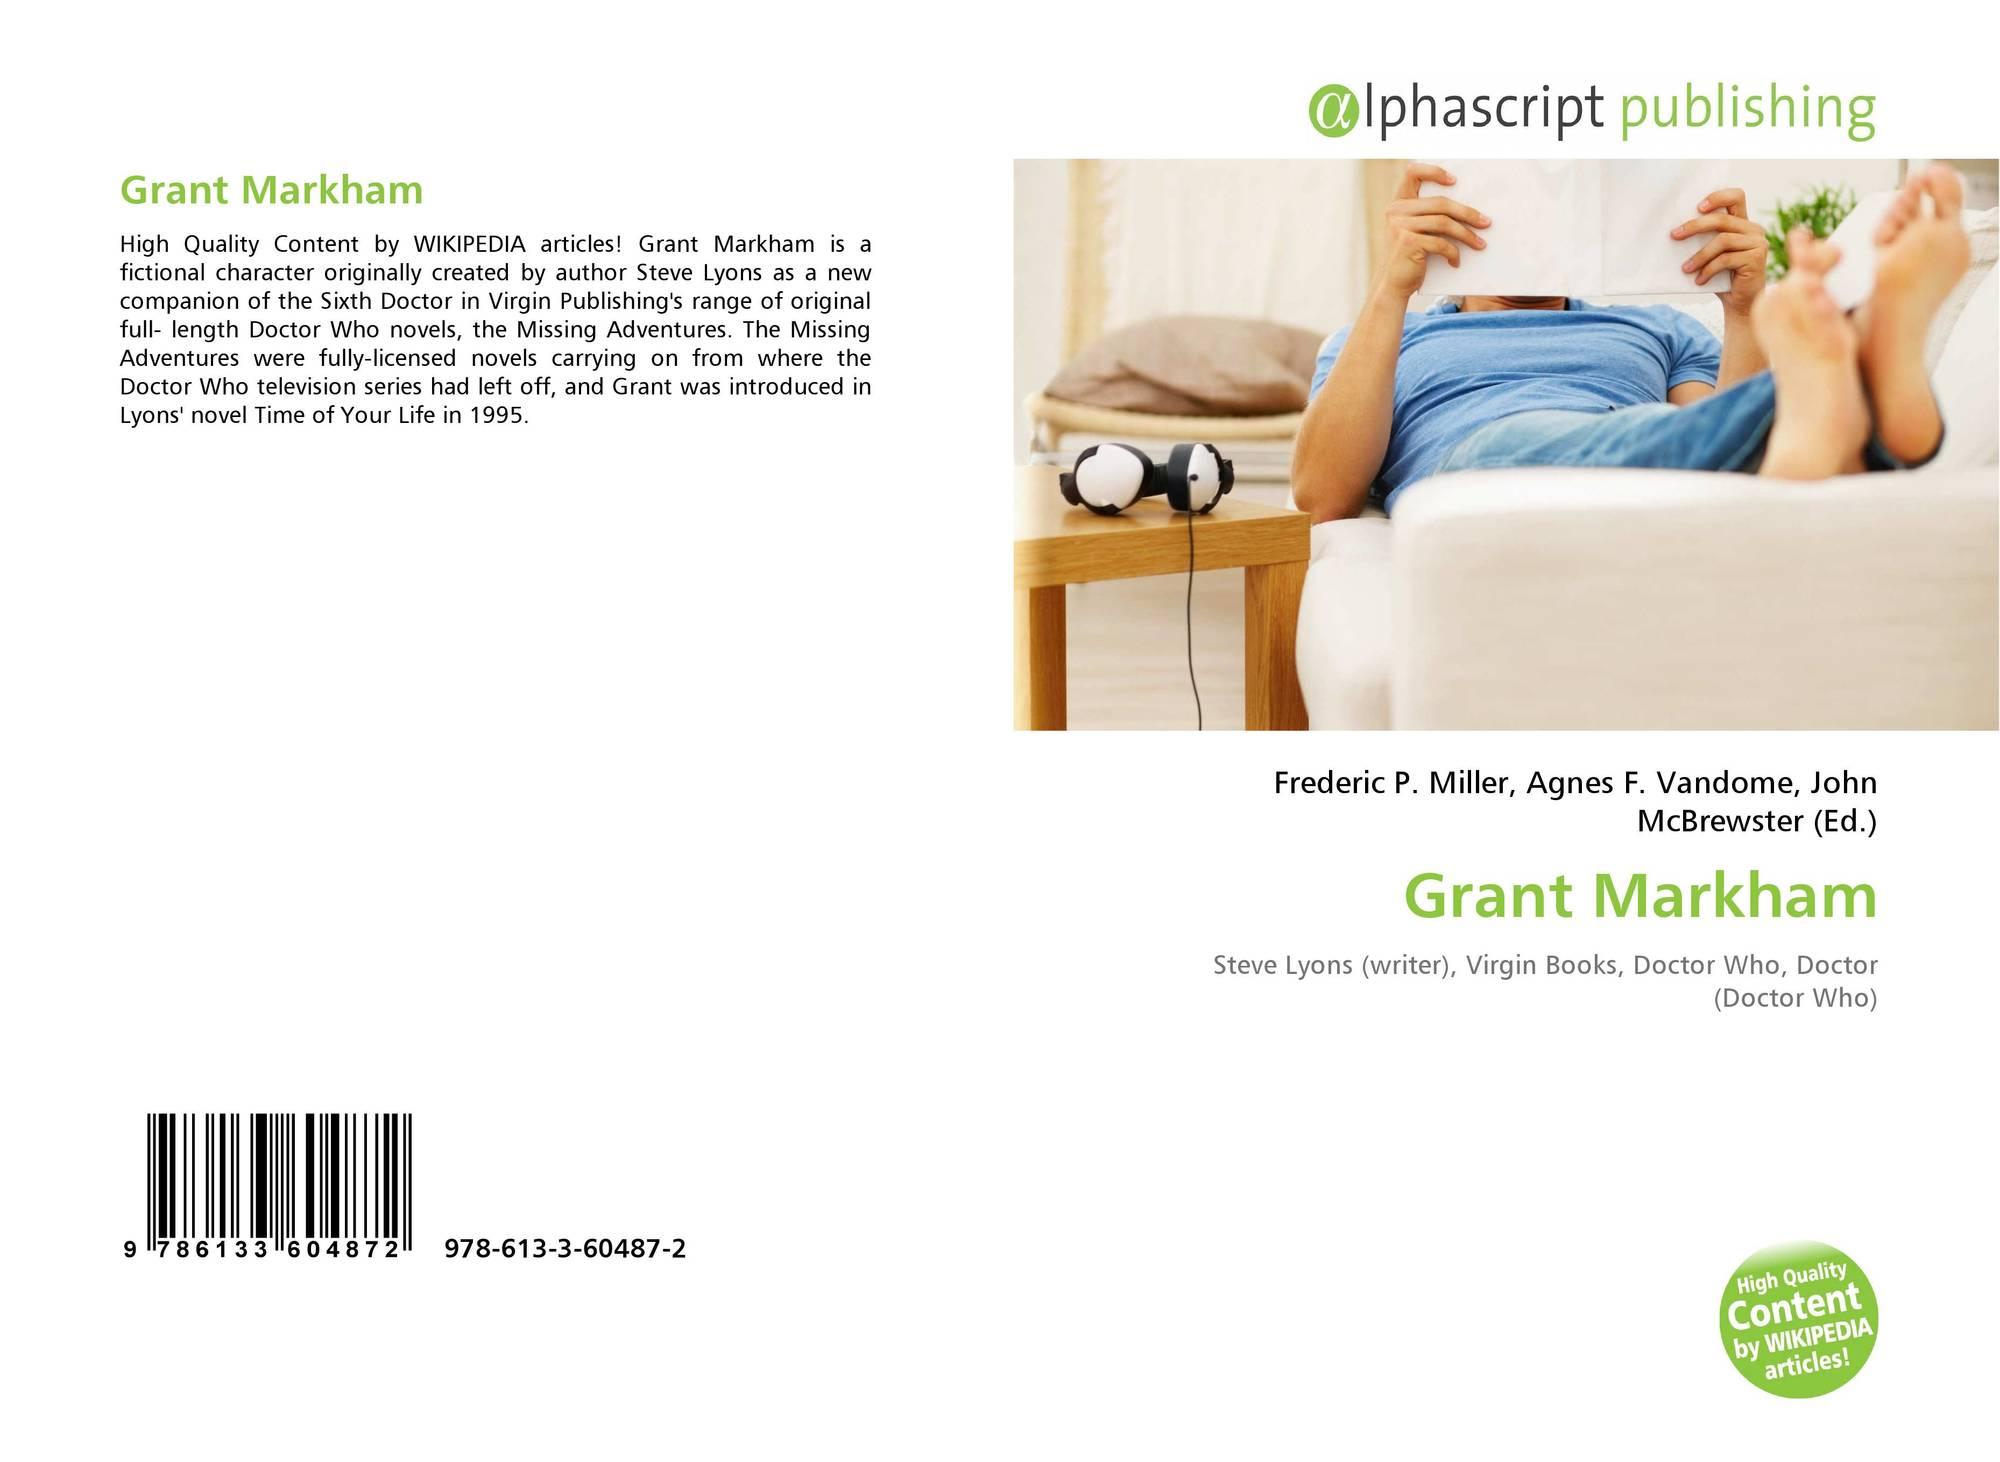 Grant Markham 978 613 3 60487 2